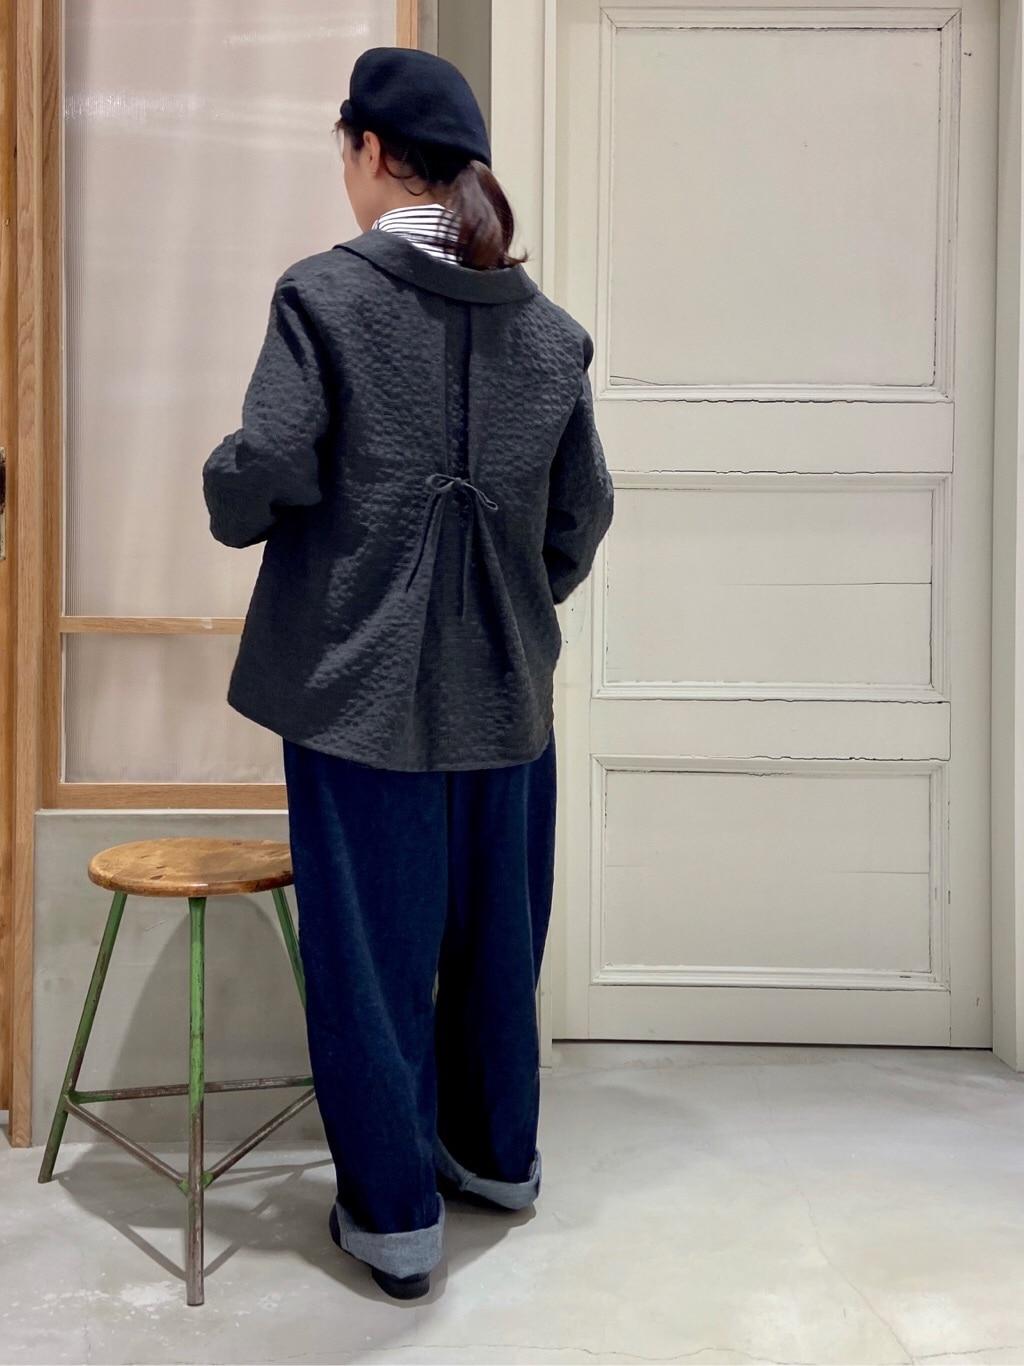 bulle de savon 渋谷スクランブルスクエア 身長:153cm 2020.11.02